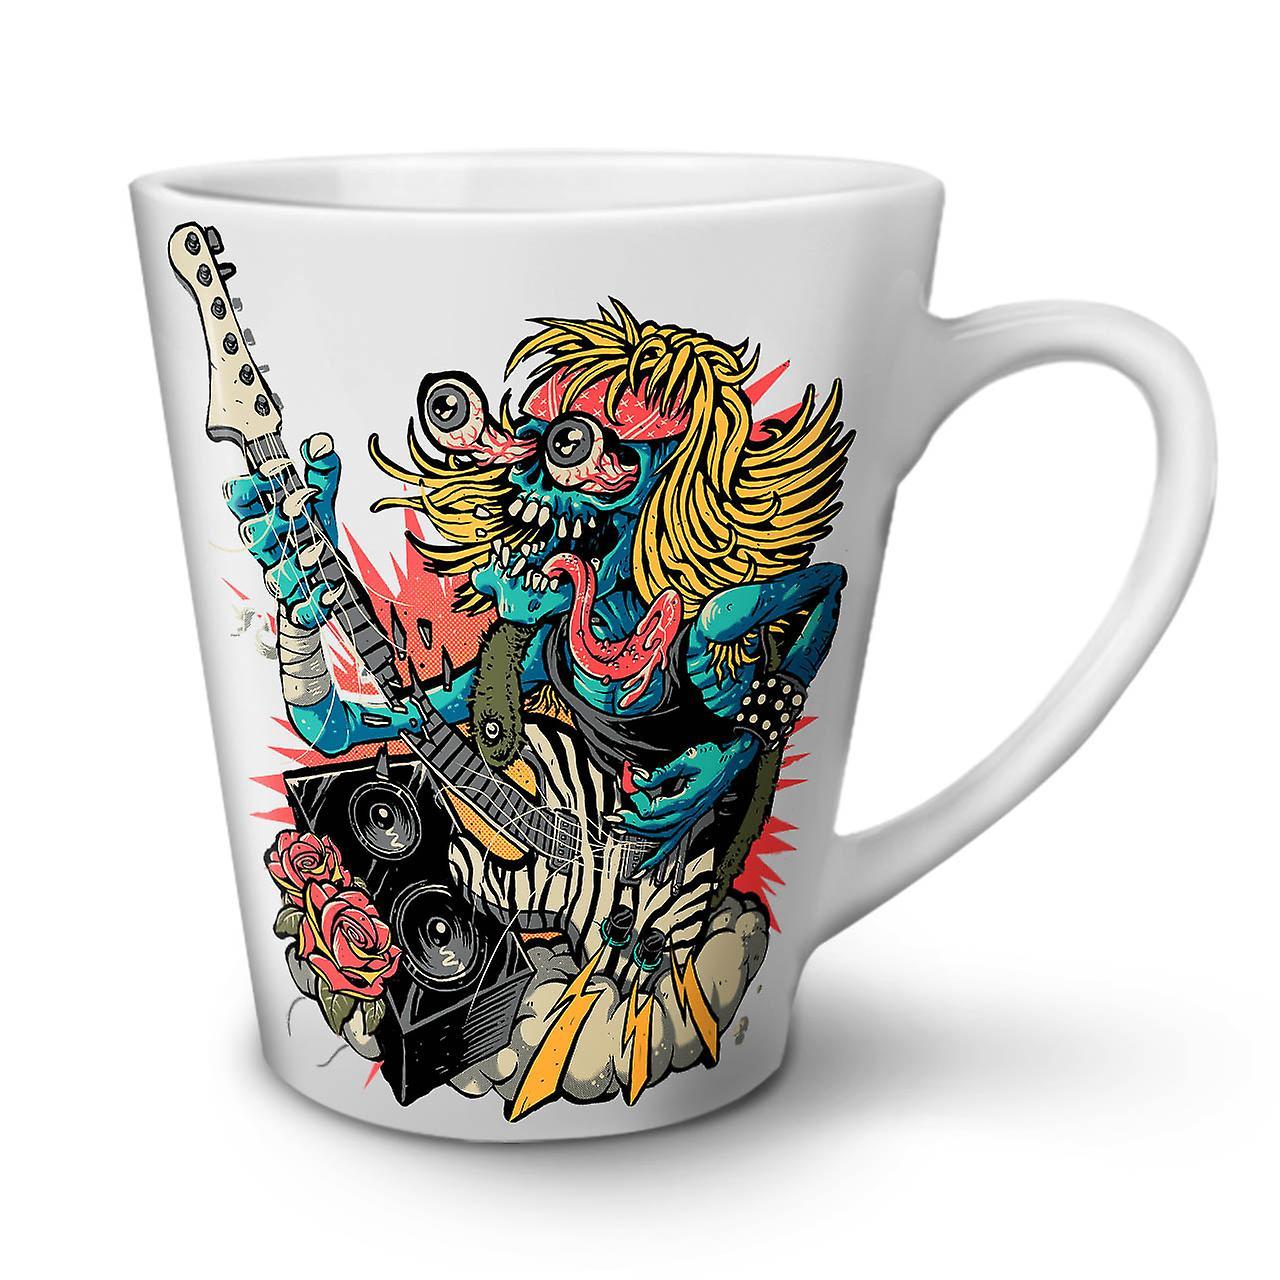 Céramique Musique Band Guitare Mug En Rock 12 OzWellcoda Nouveau Blanc Thé Latte Café QBtdrhxCs